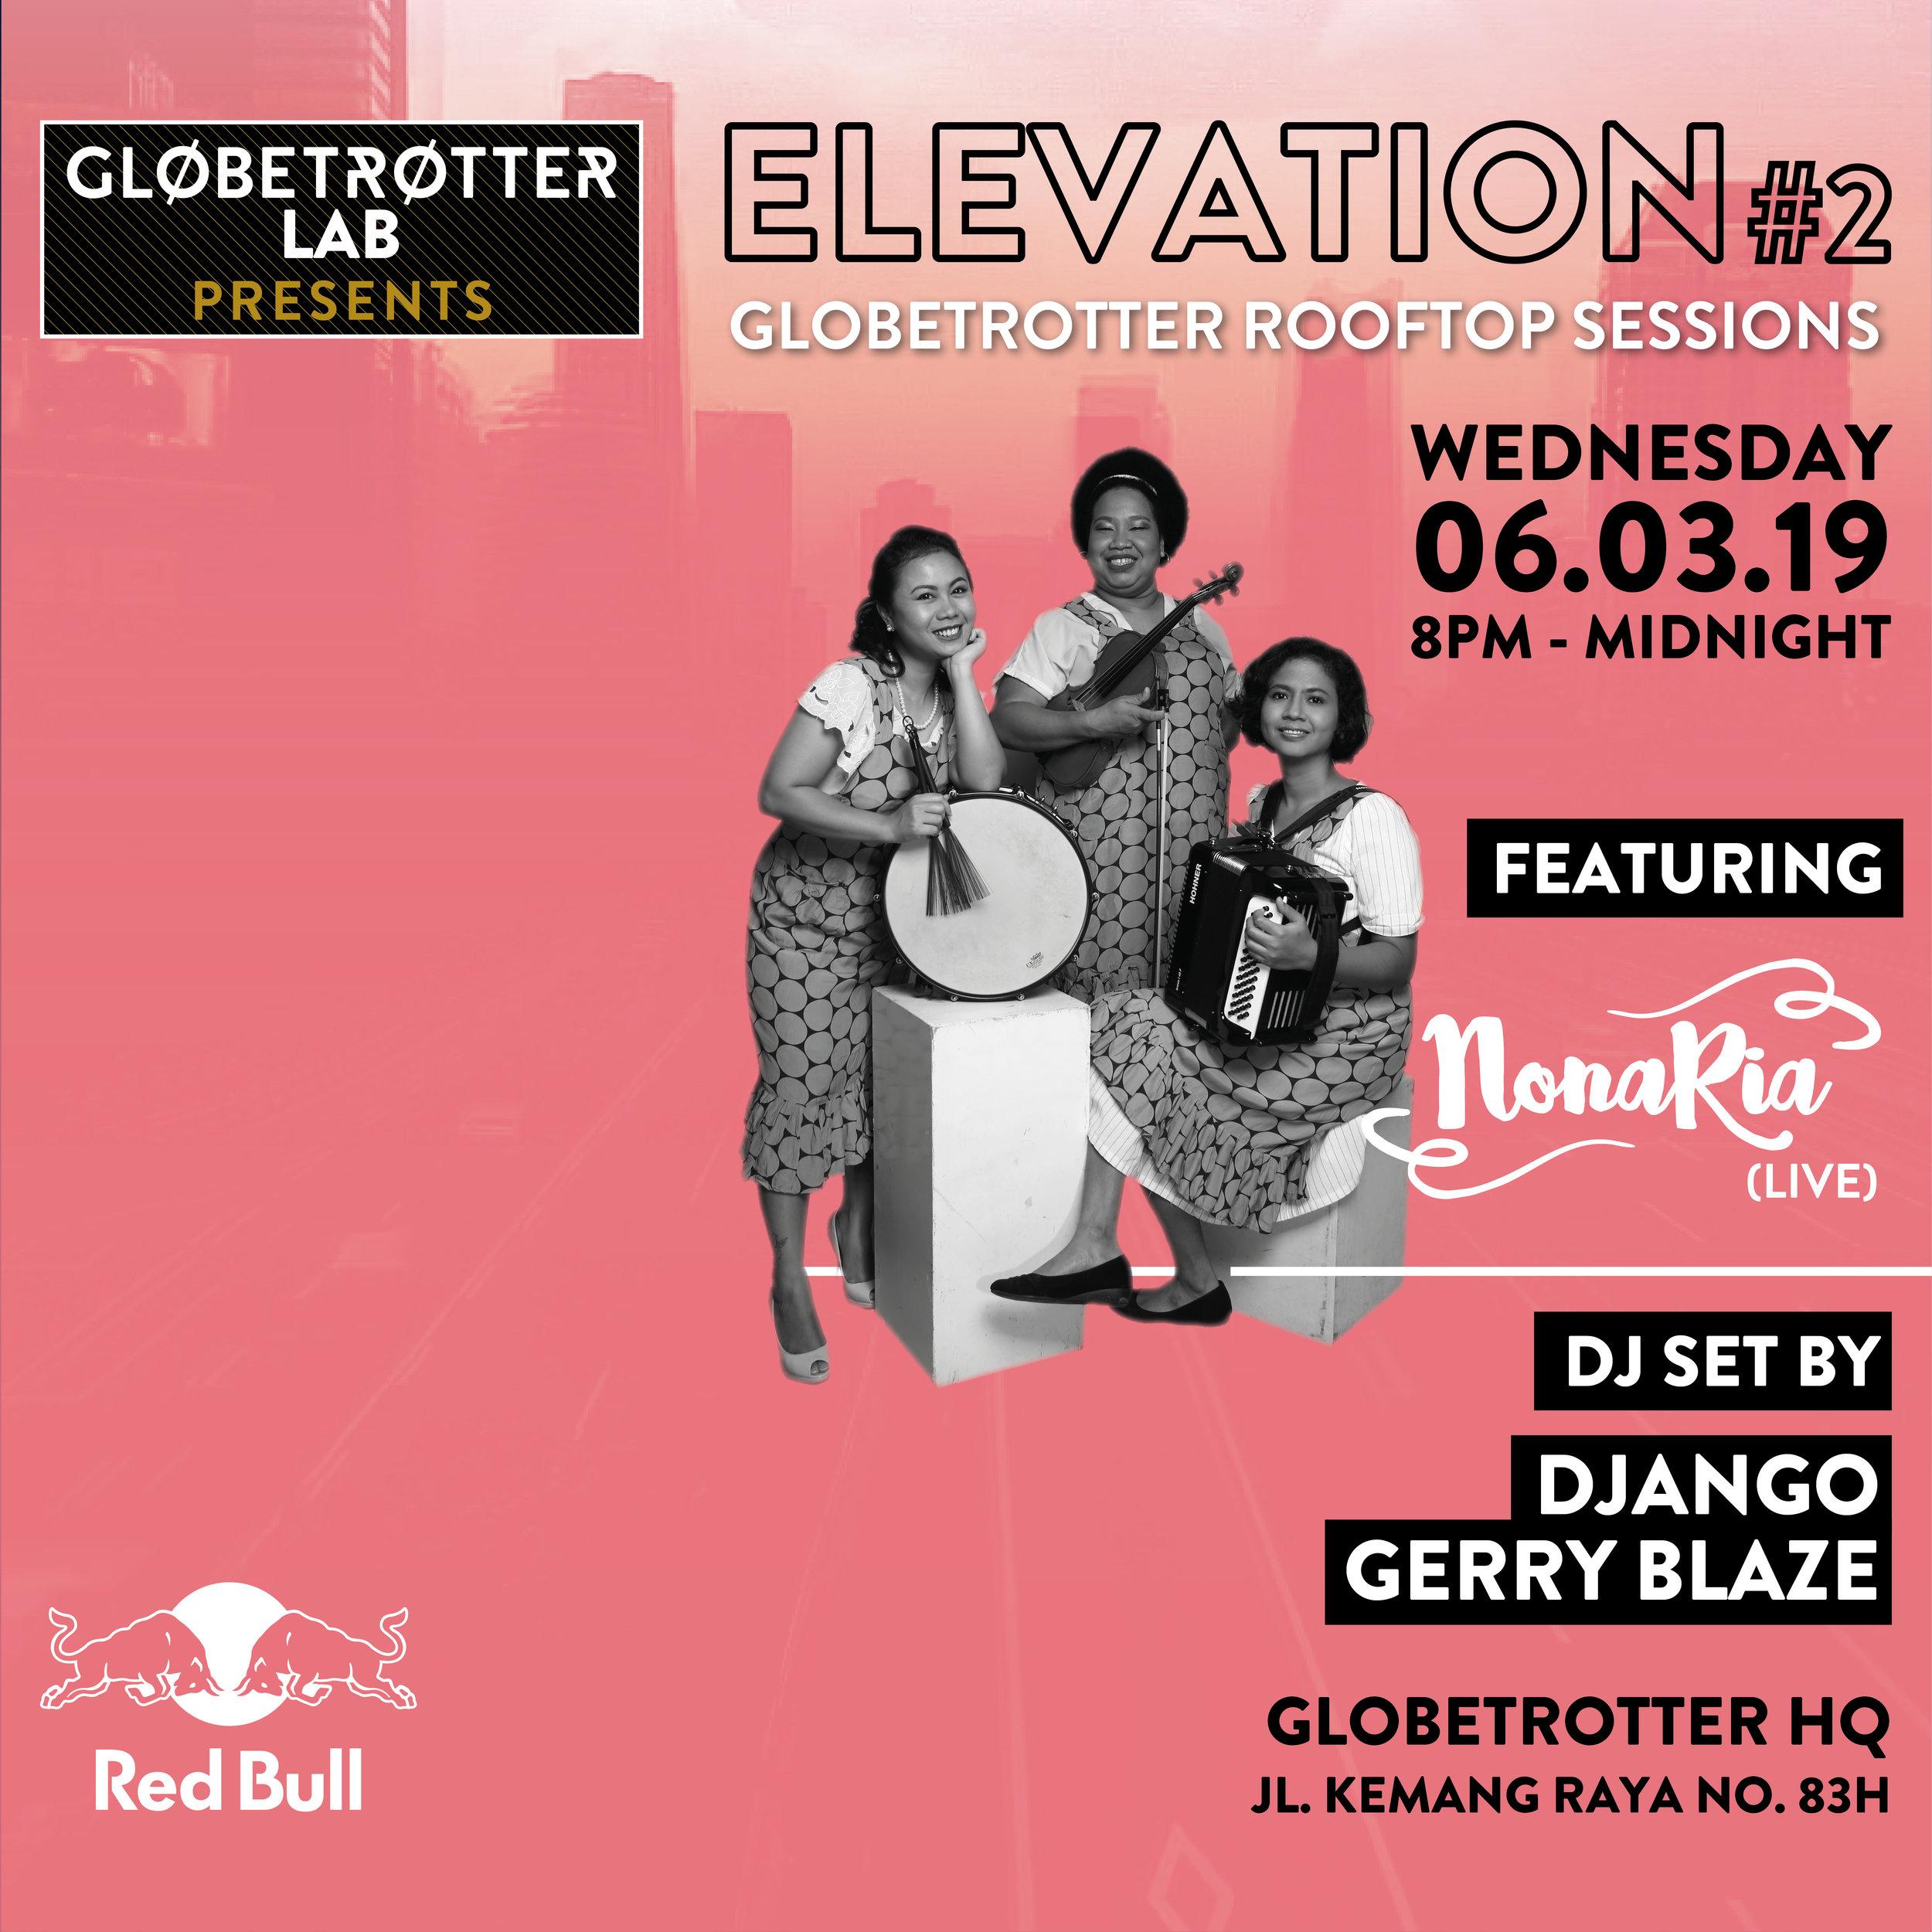 6 march 2019; globetrotter lab elevation featuring nonaria django gerry blaze; jakarta, indonesia; globetrotter magazine.jpg